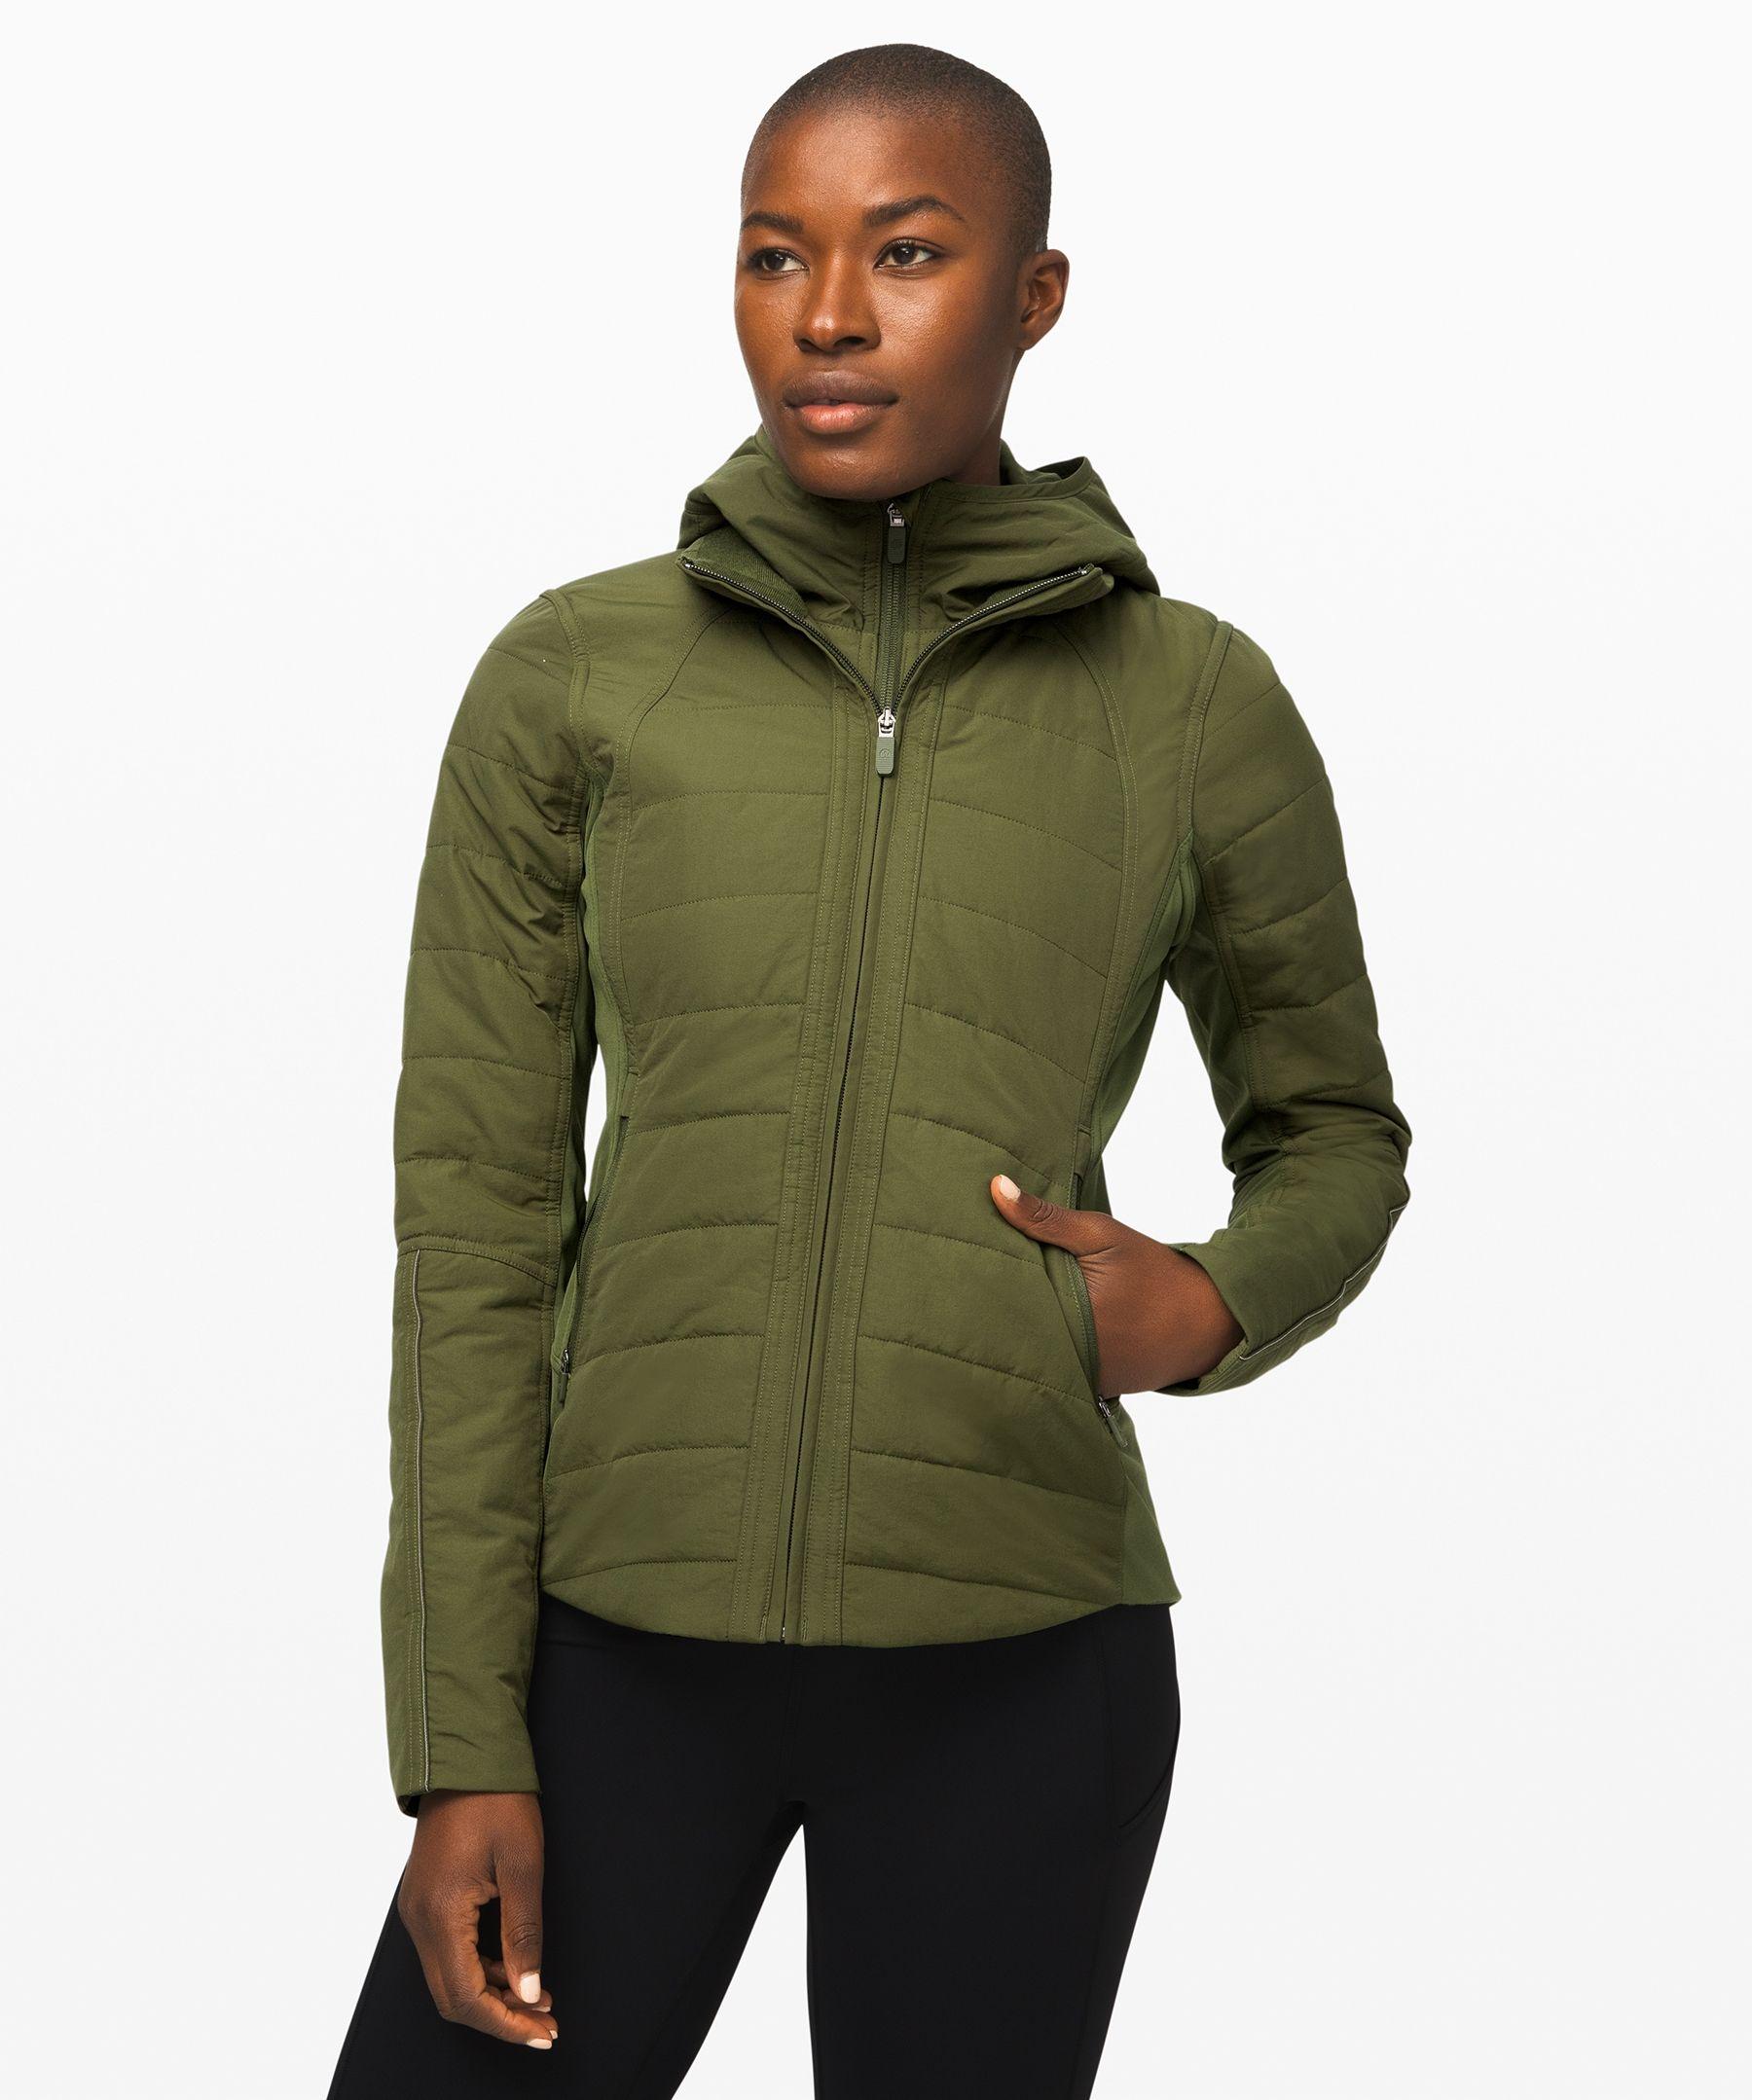 Another Mile Jacket Women S Jackets Coats Lululemon Coats Jackets Women Jackets For Women Jackets [ 2158 x 1800 Pixel ]